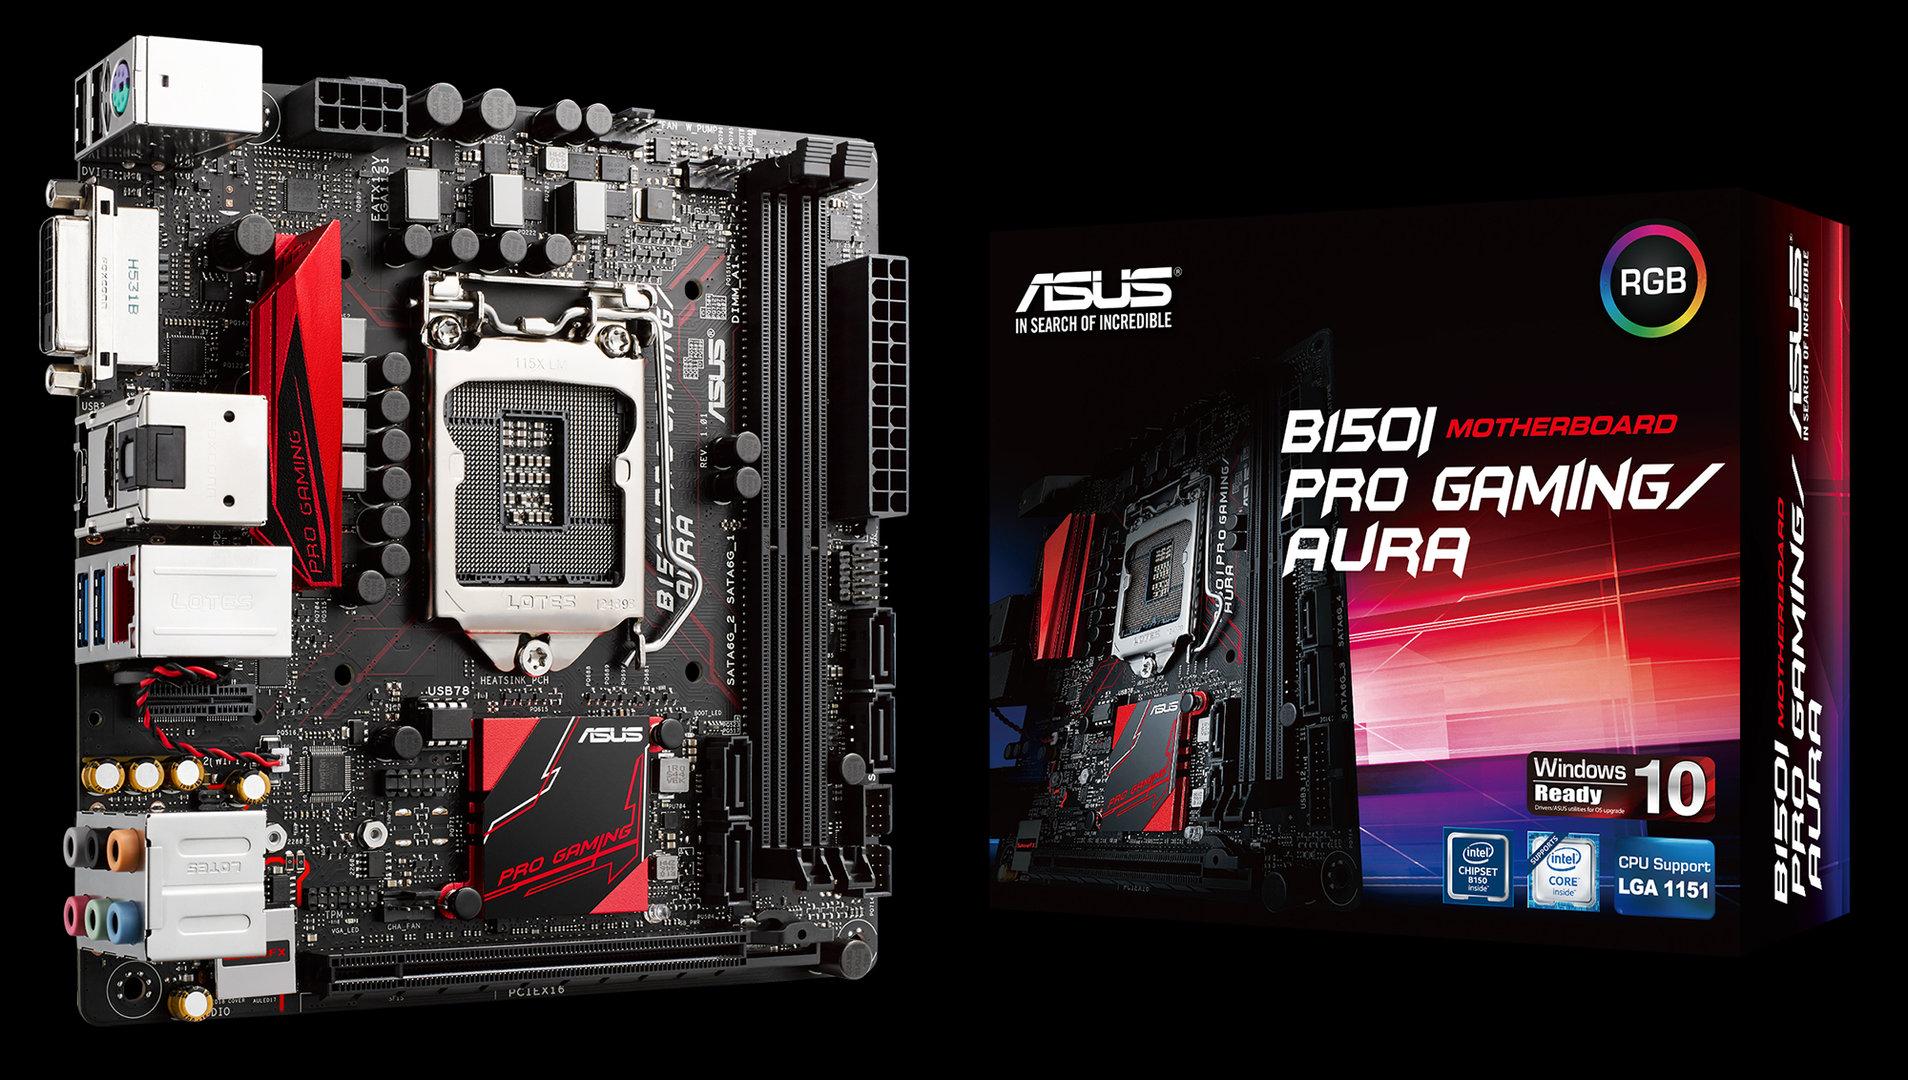 Asus B150I Pro Gaming/Aura